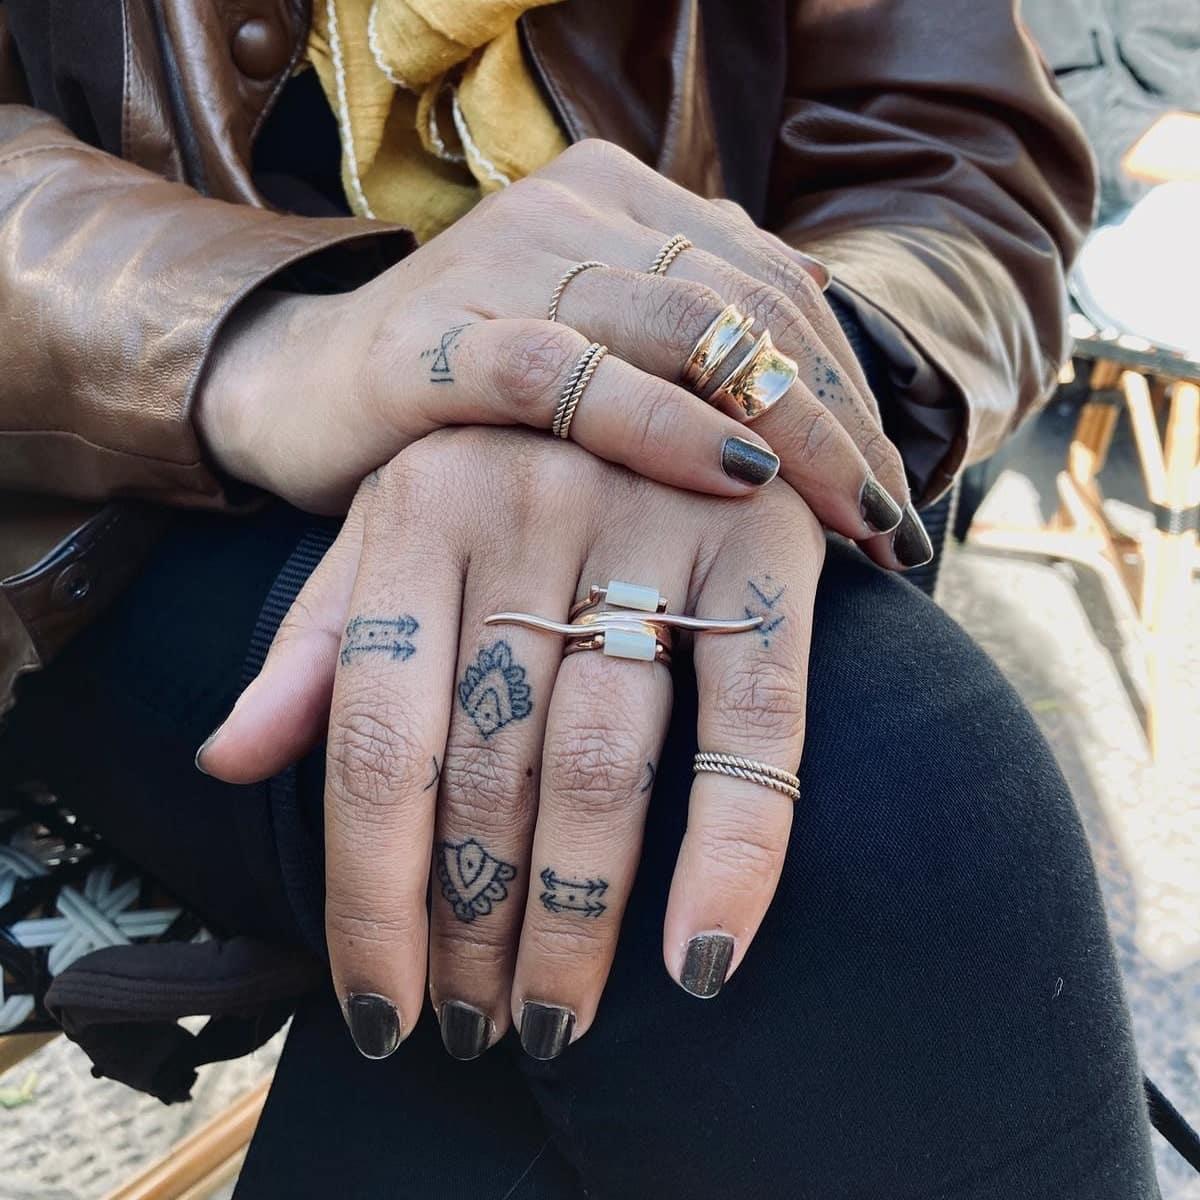 valiente-ave-tattoo-artist-hands